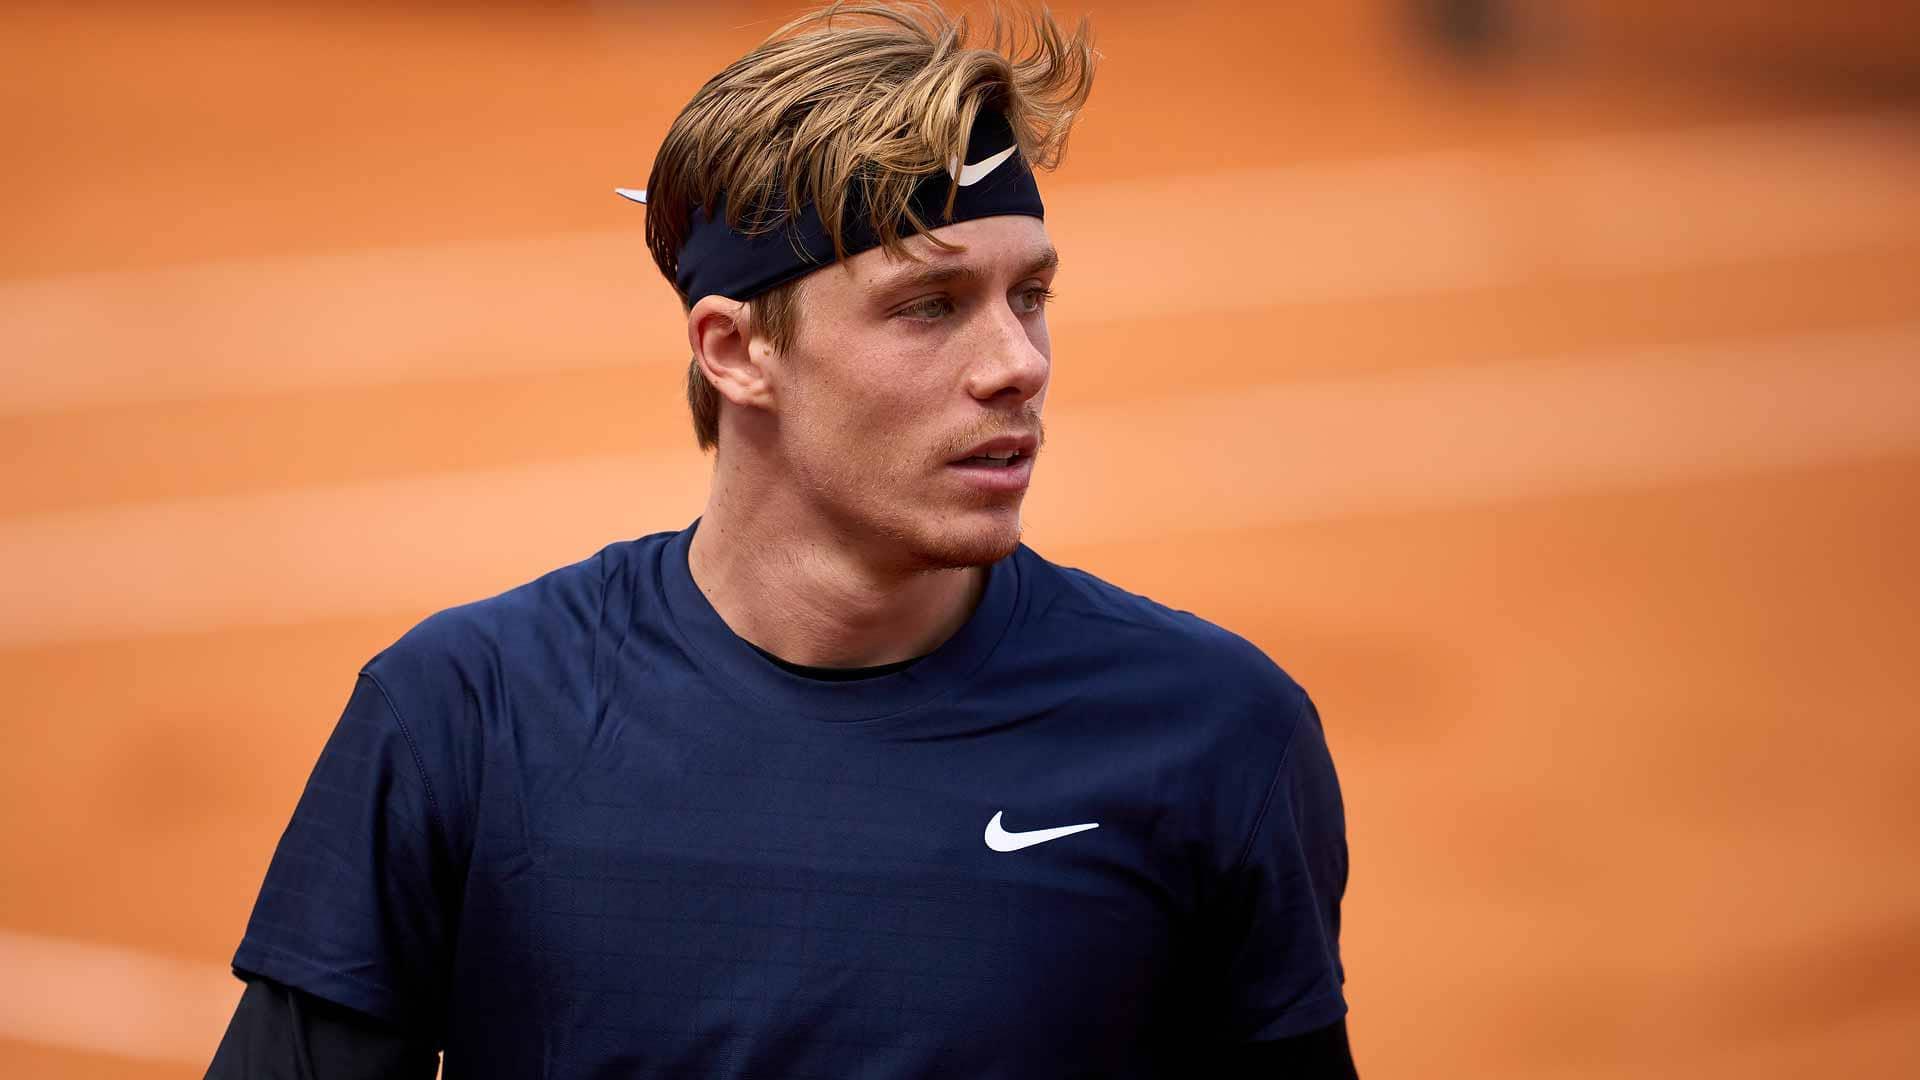 Estoril Open 2021: Denis Shapovalov vs. Corentin Moutet Tennis Pick and Prediction